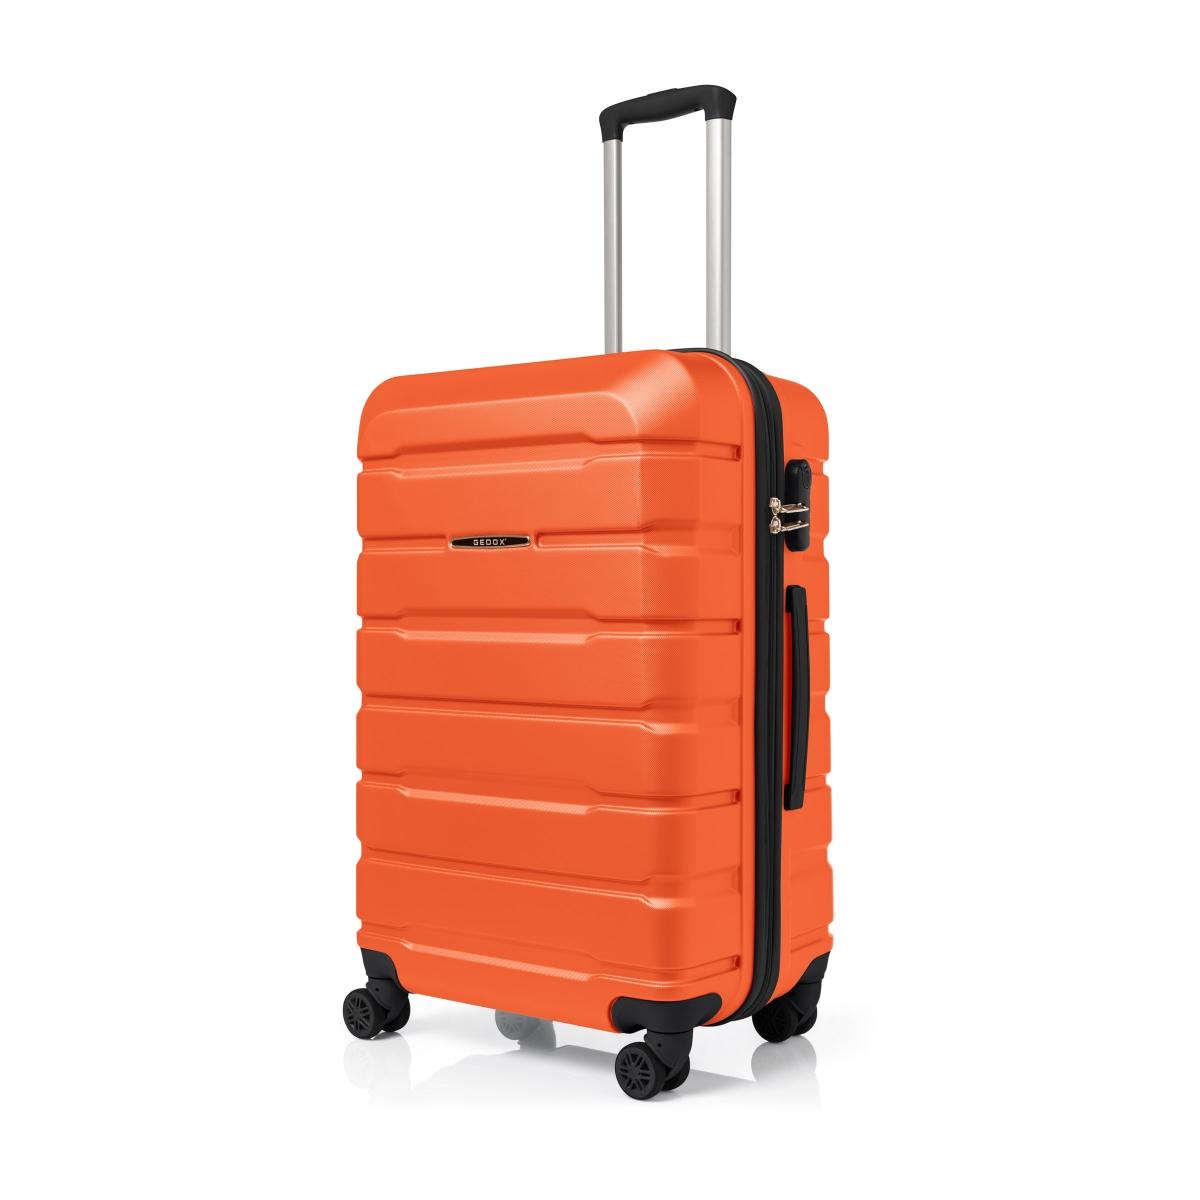 Gedox Abs Premium Tonaton 3'lü Valiz Seyahat Seti - Model:500.15 Turuncu